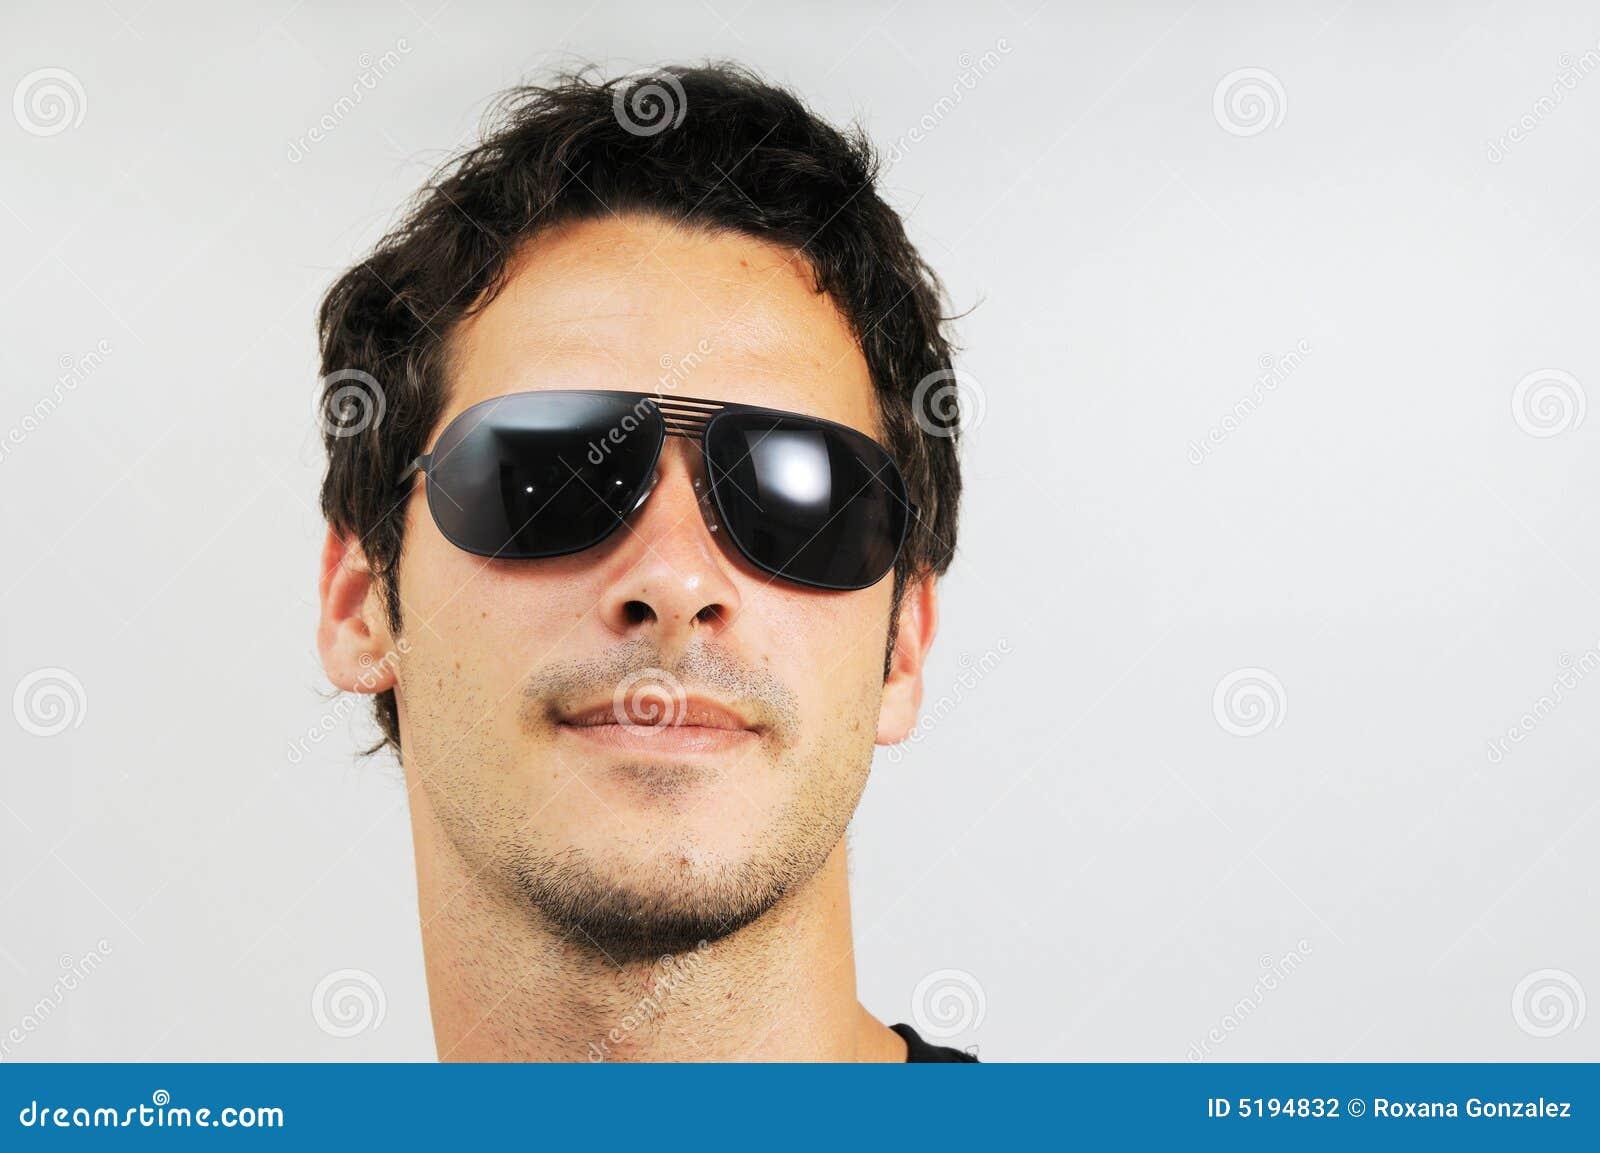 Man with fashion sunglasses